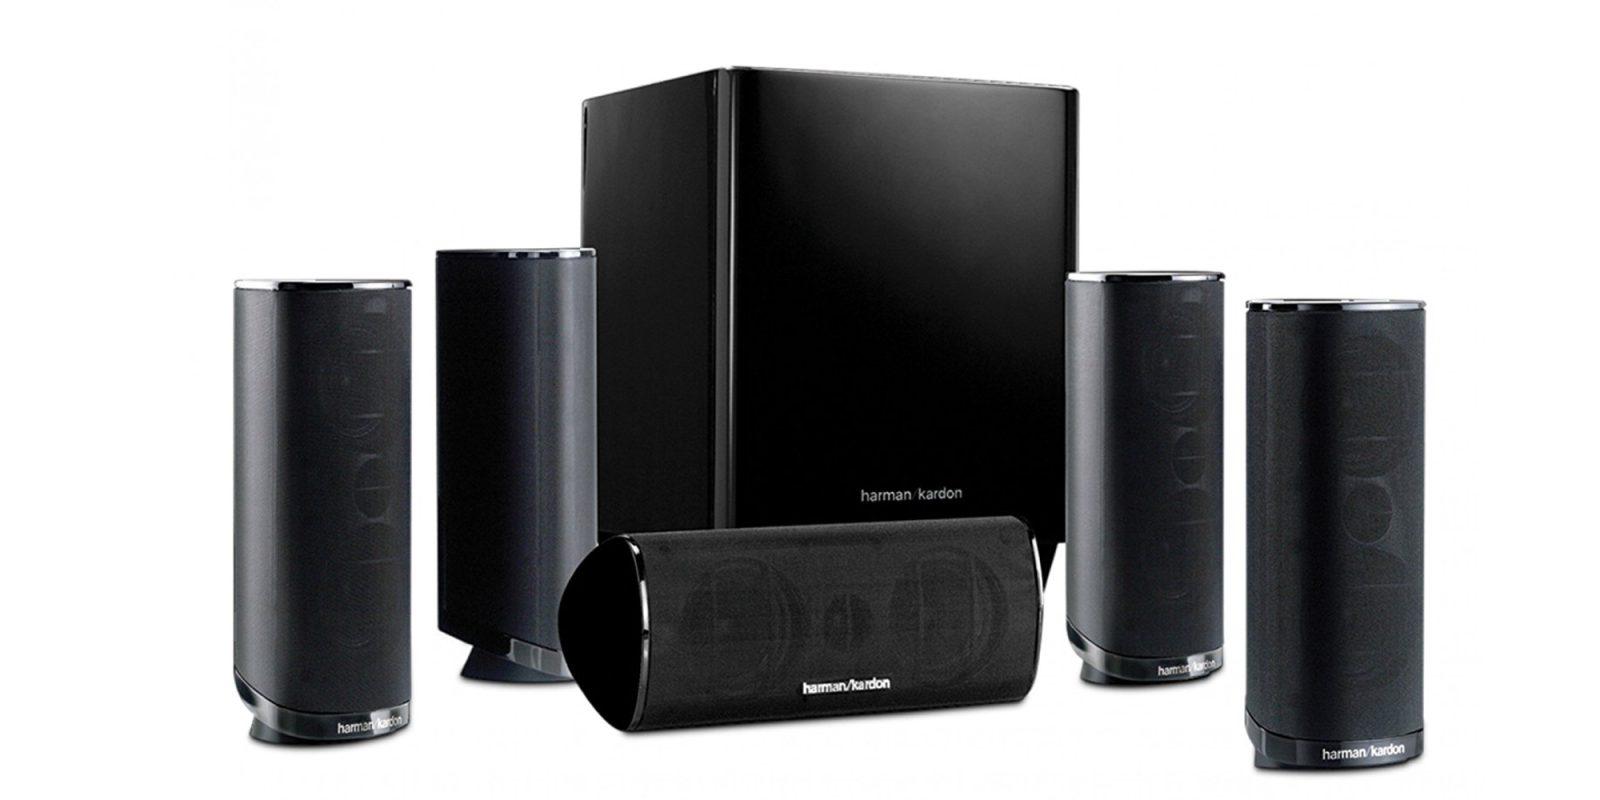 Harman Kardon 5 1 Ch Home Theater Speaker System 140